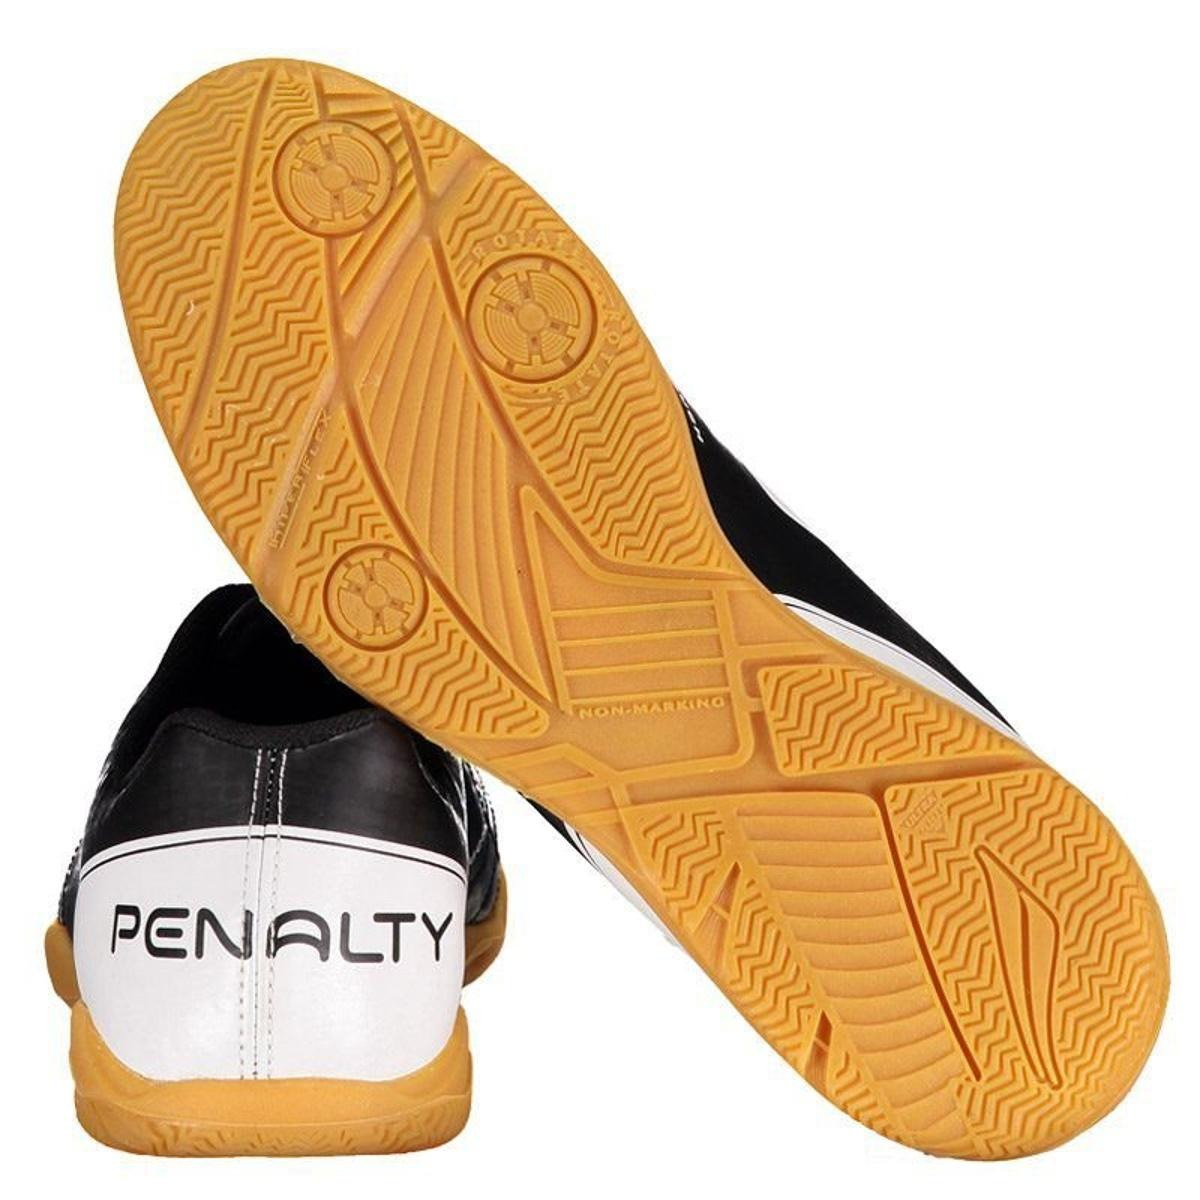 Chuteira Penalty Matís Viii Futsal Preta Super Leve - R  129 d92b1dbe223fa